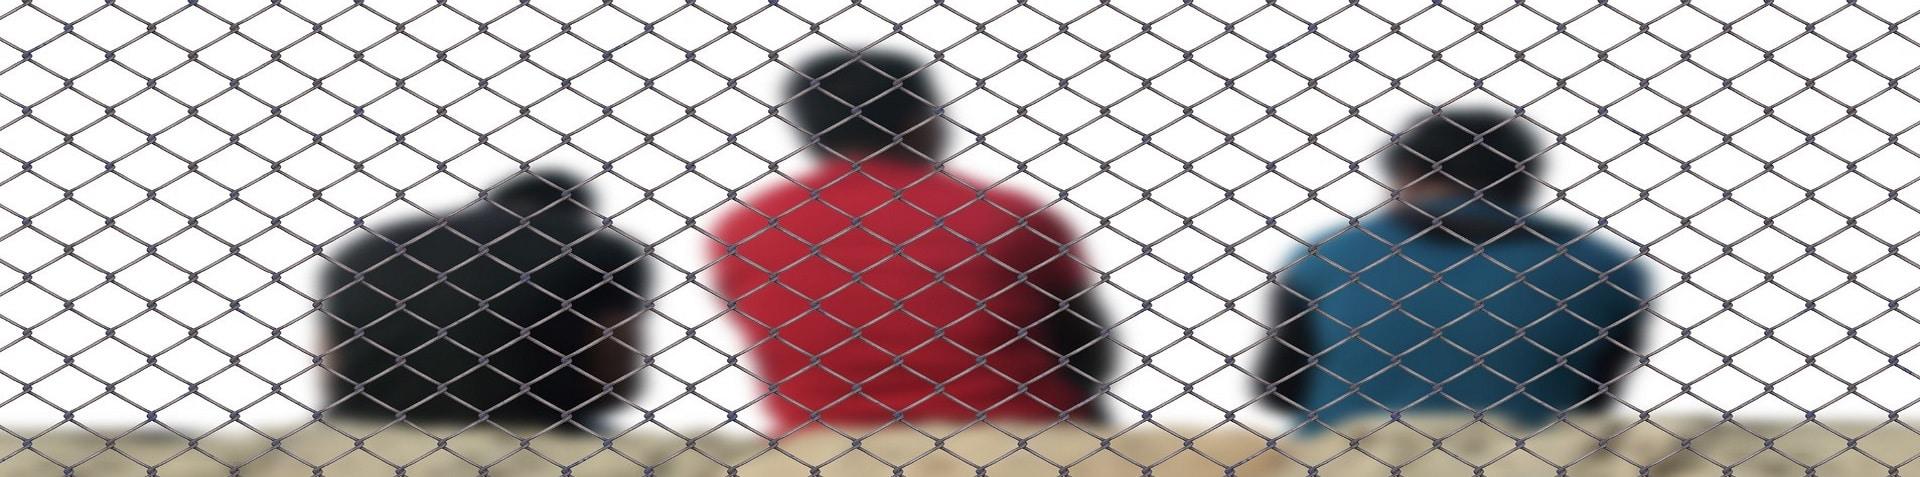 Rechtsanwalt Abschiebung: Personen sitzen hinter einem Zaun